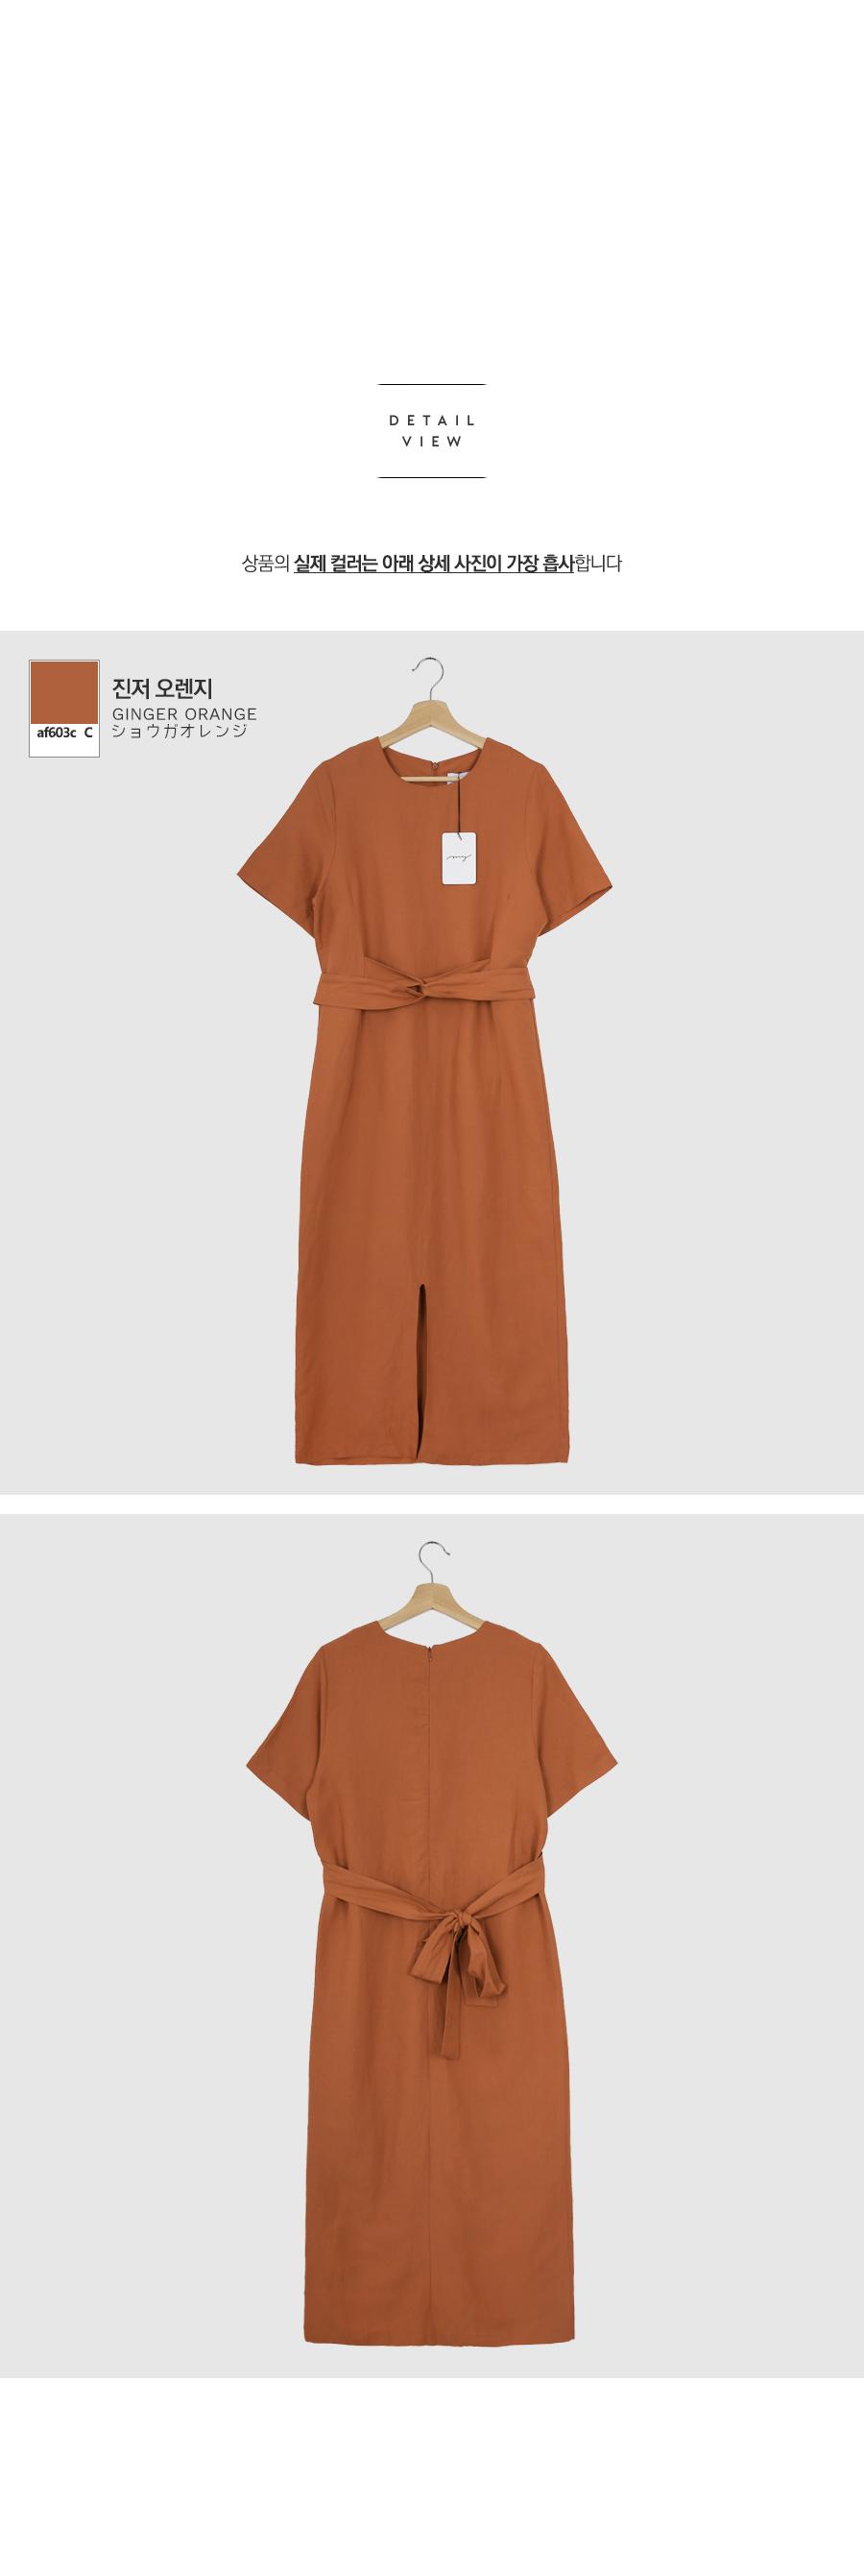 My-littleclassic / Miranda-Linen Twist Dress